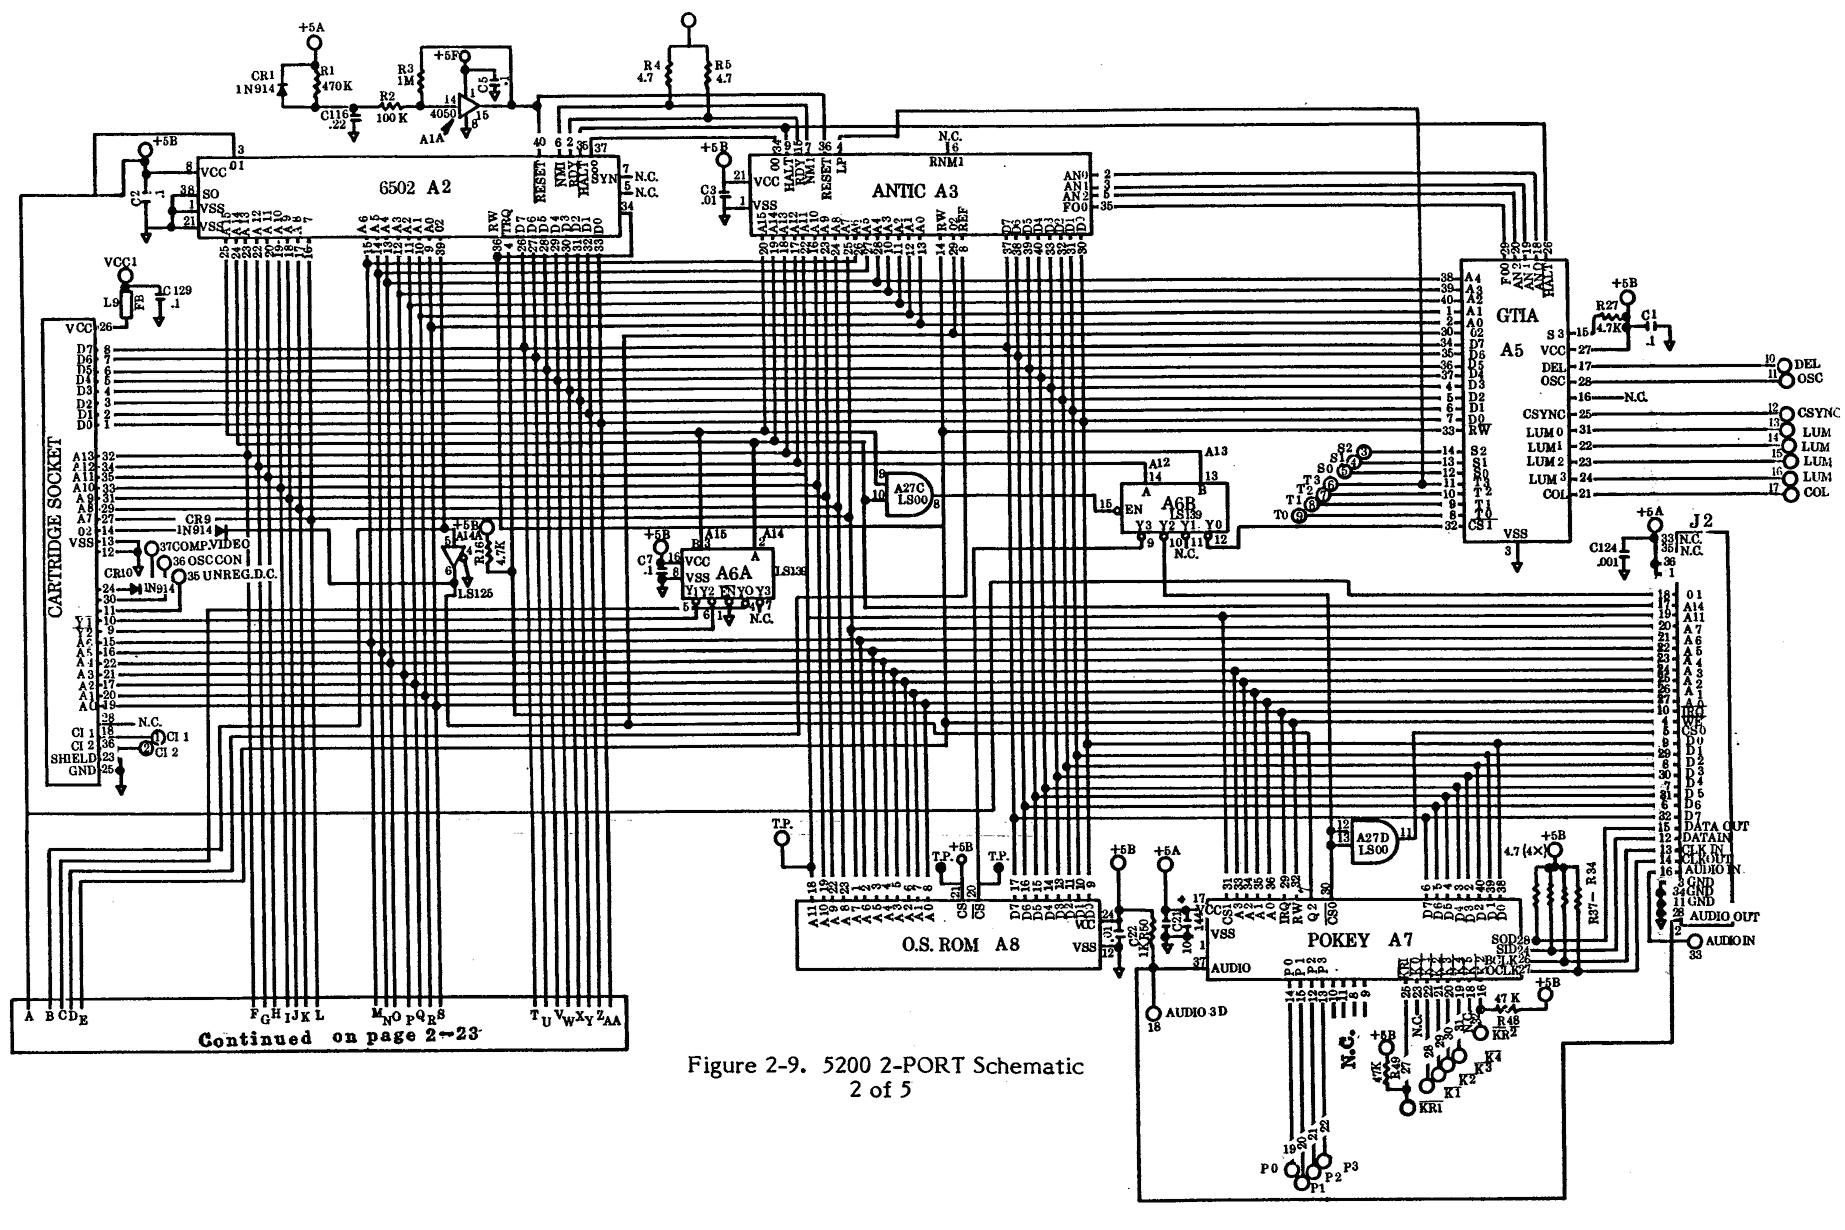 atari 5200 controller wiring diagram gameboy color